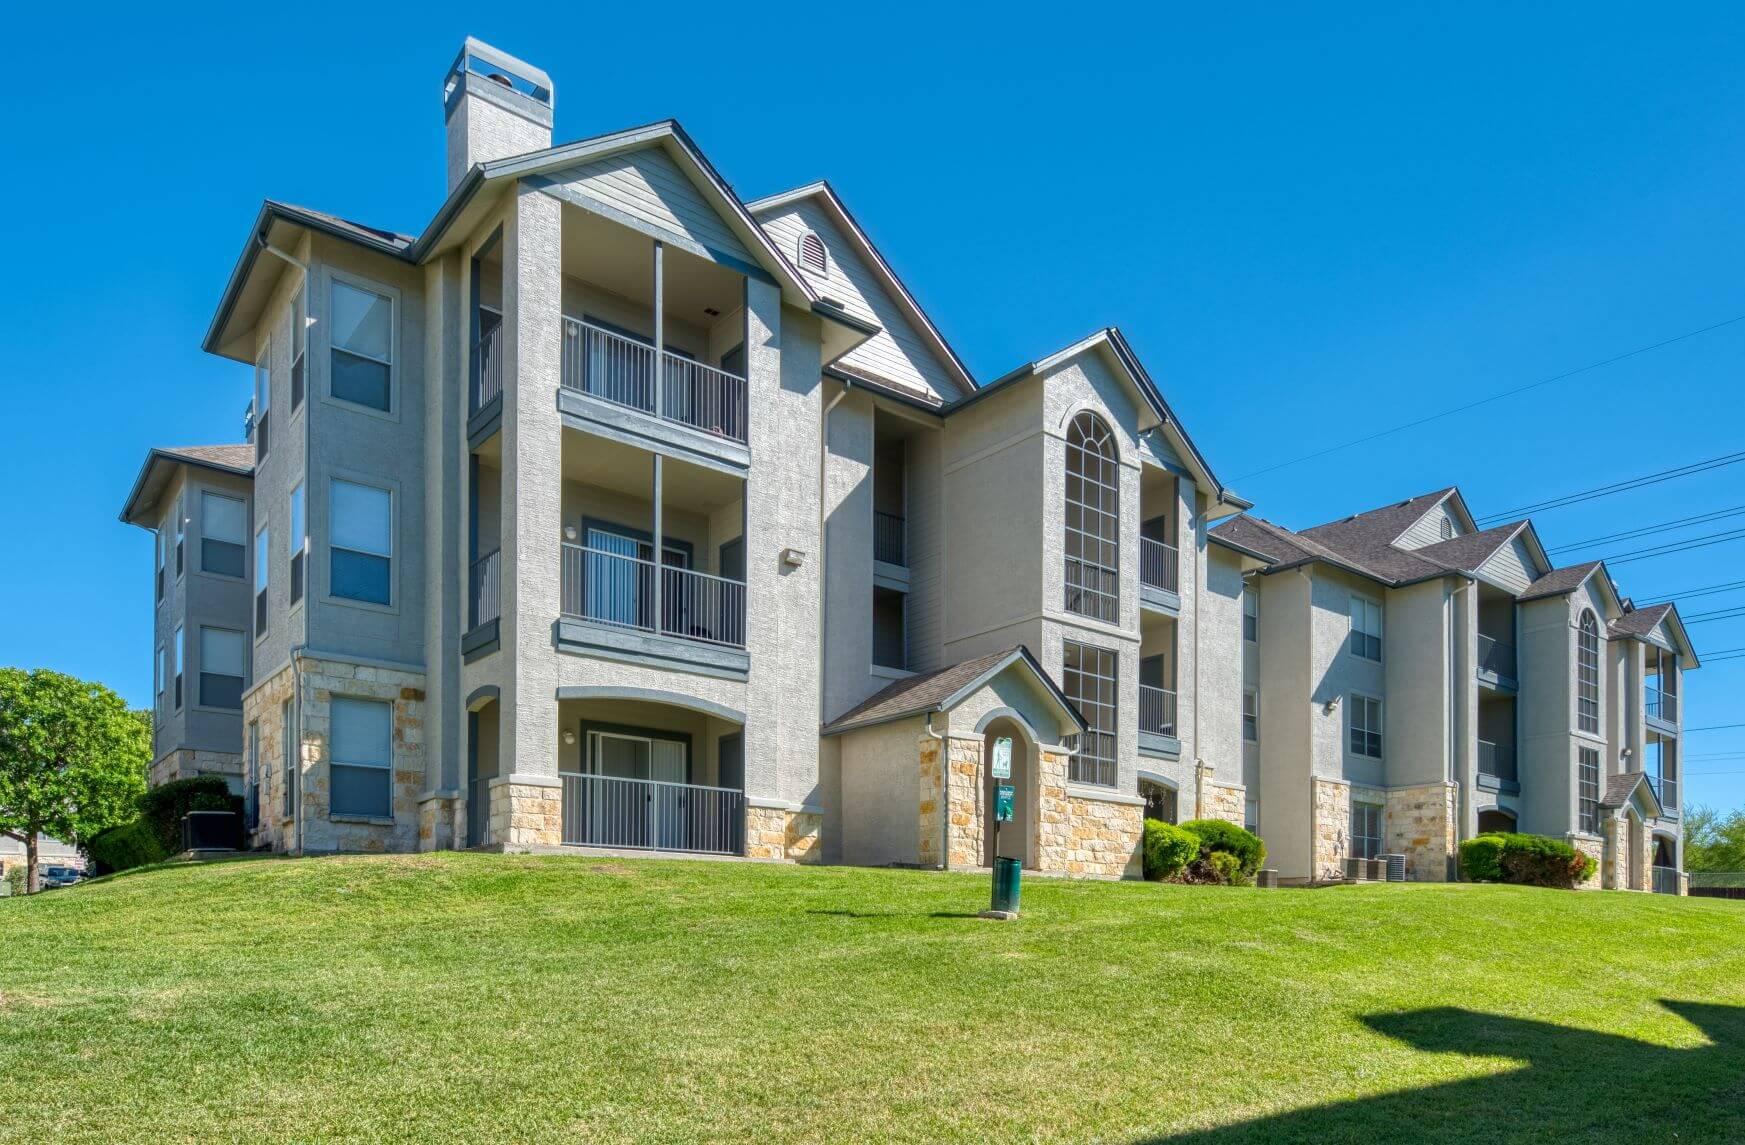 100 Best Apartments Under 800 In San Antonio Tx